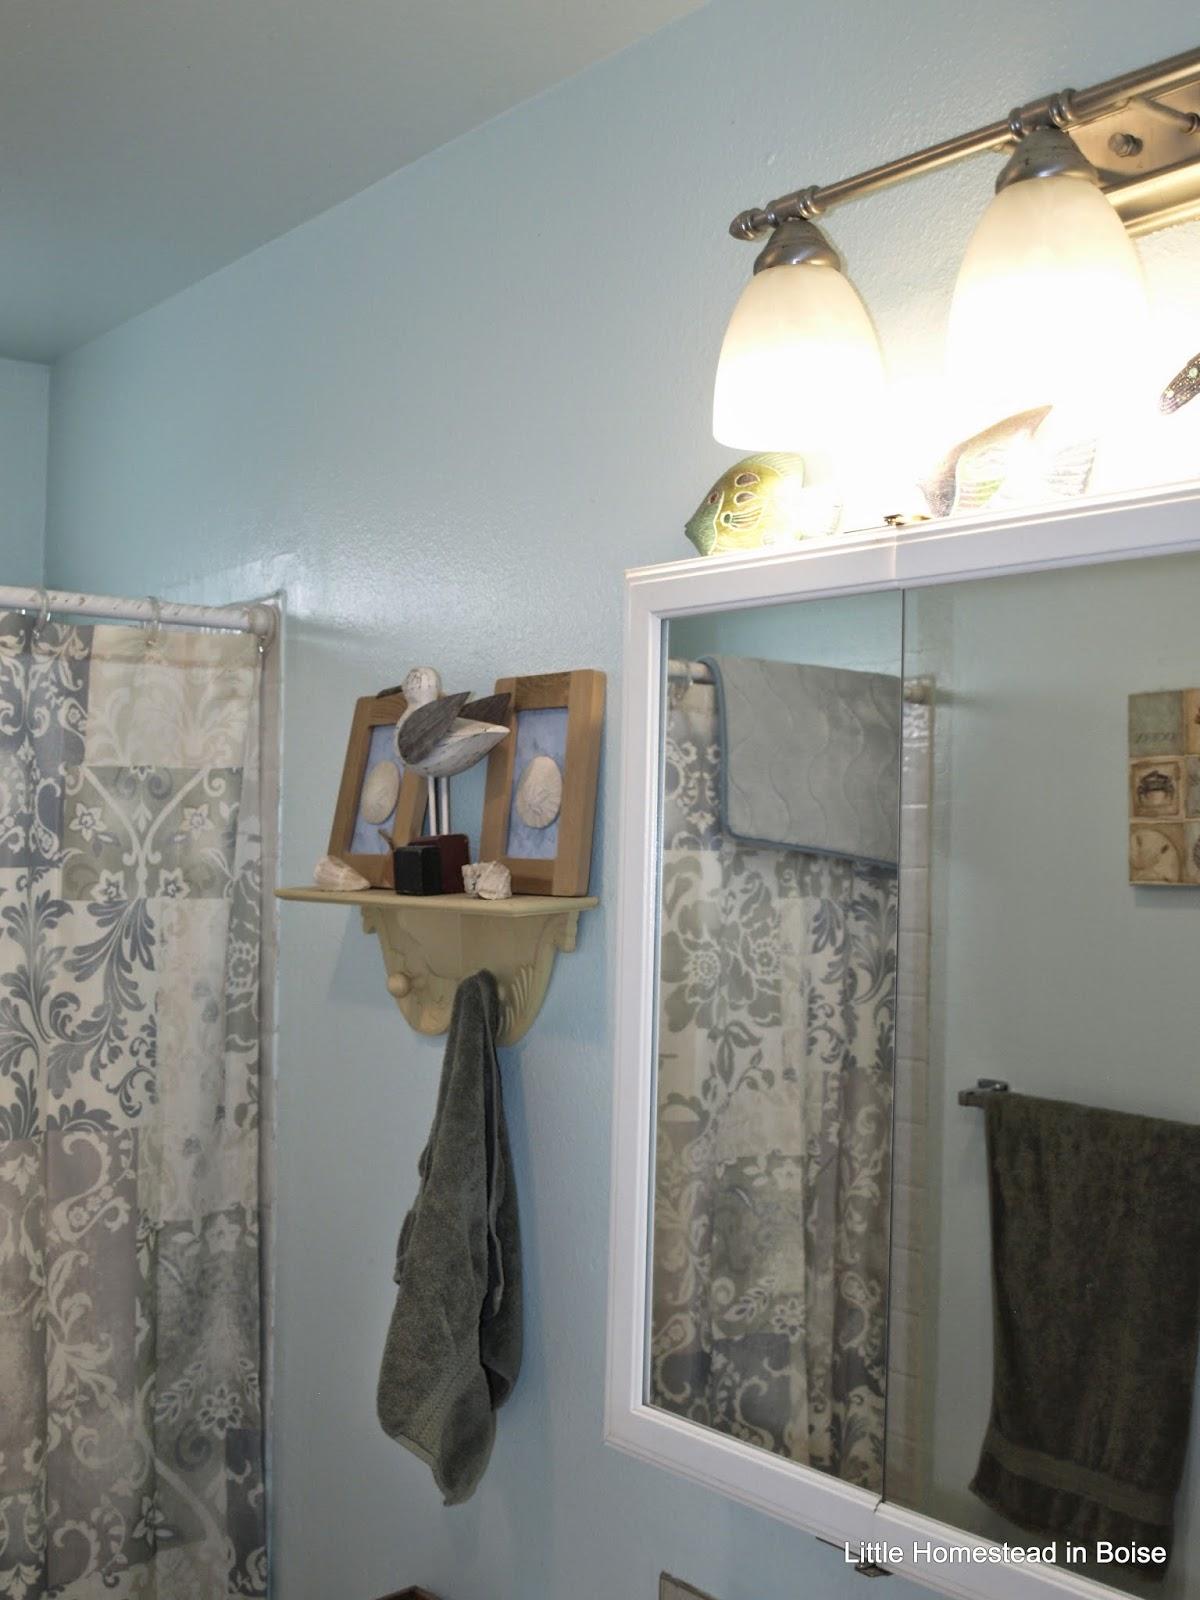 Little Homestead in Boise Bathroom Remodel Starts Day 1